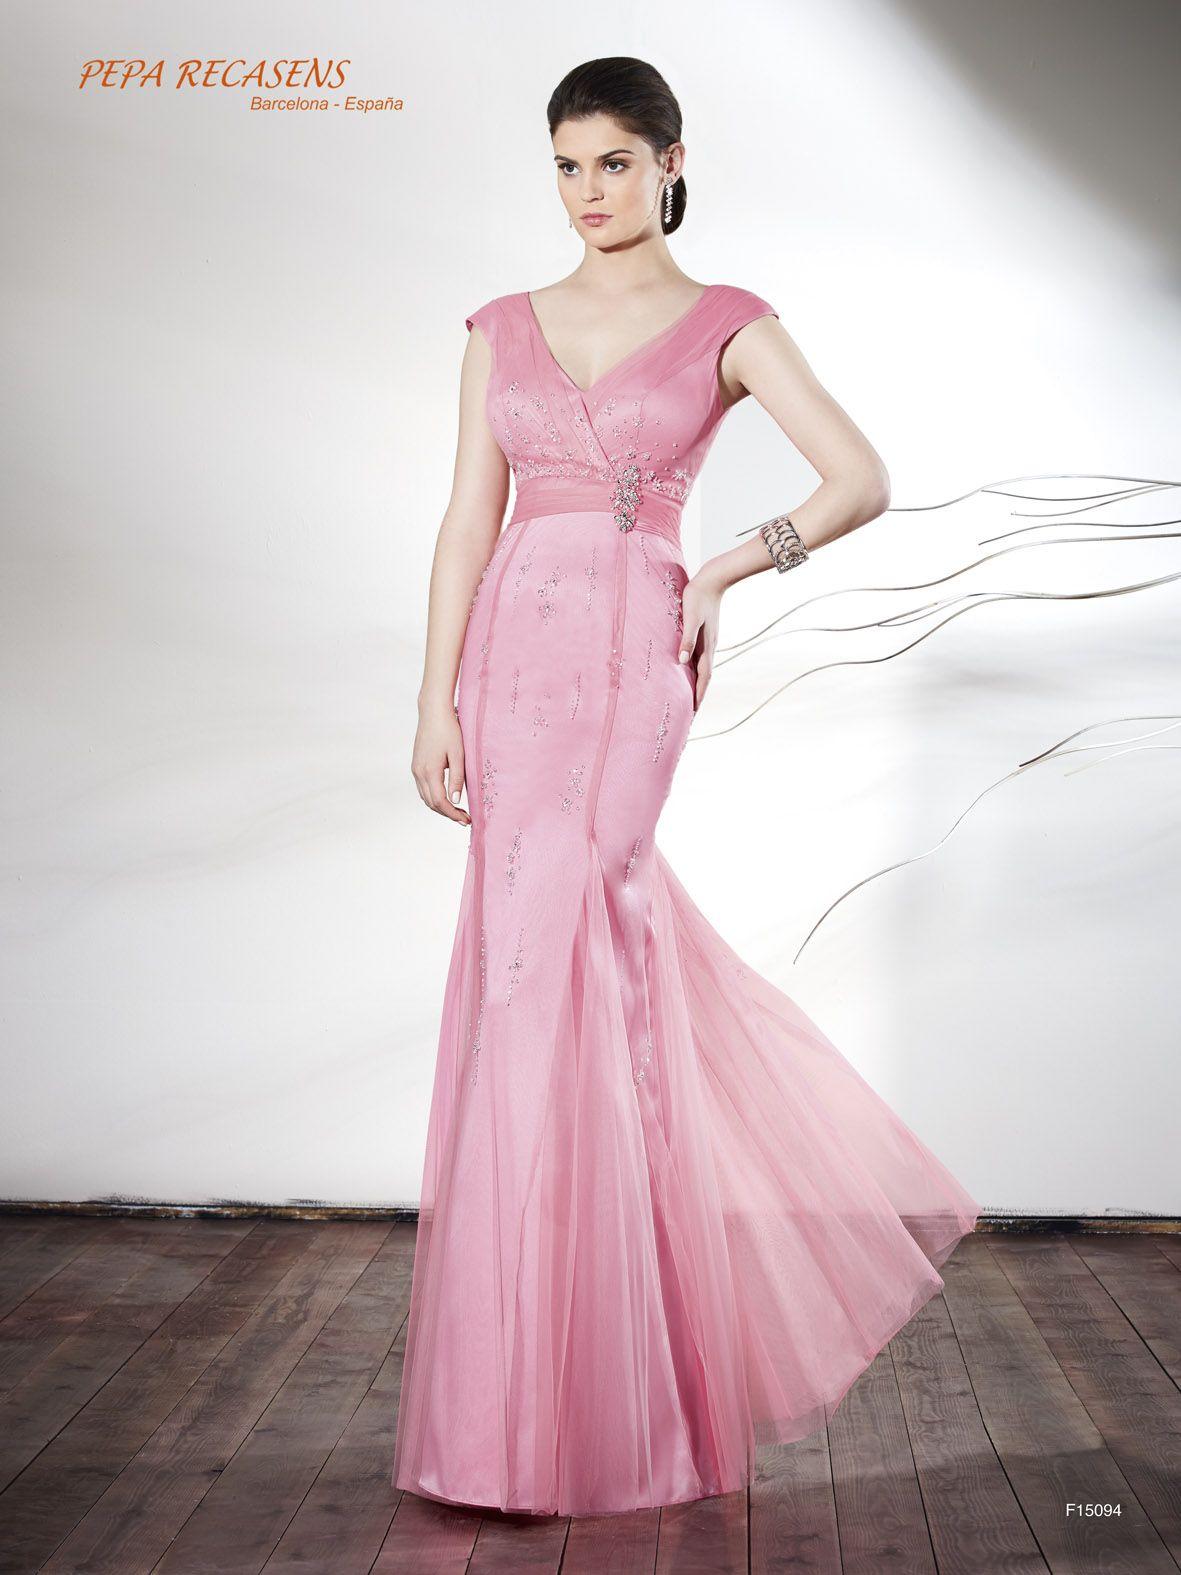 Vestido de fiesta Pepa Recasens modelo F15094 | talentos | Pinterest